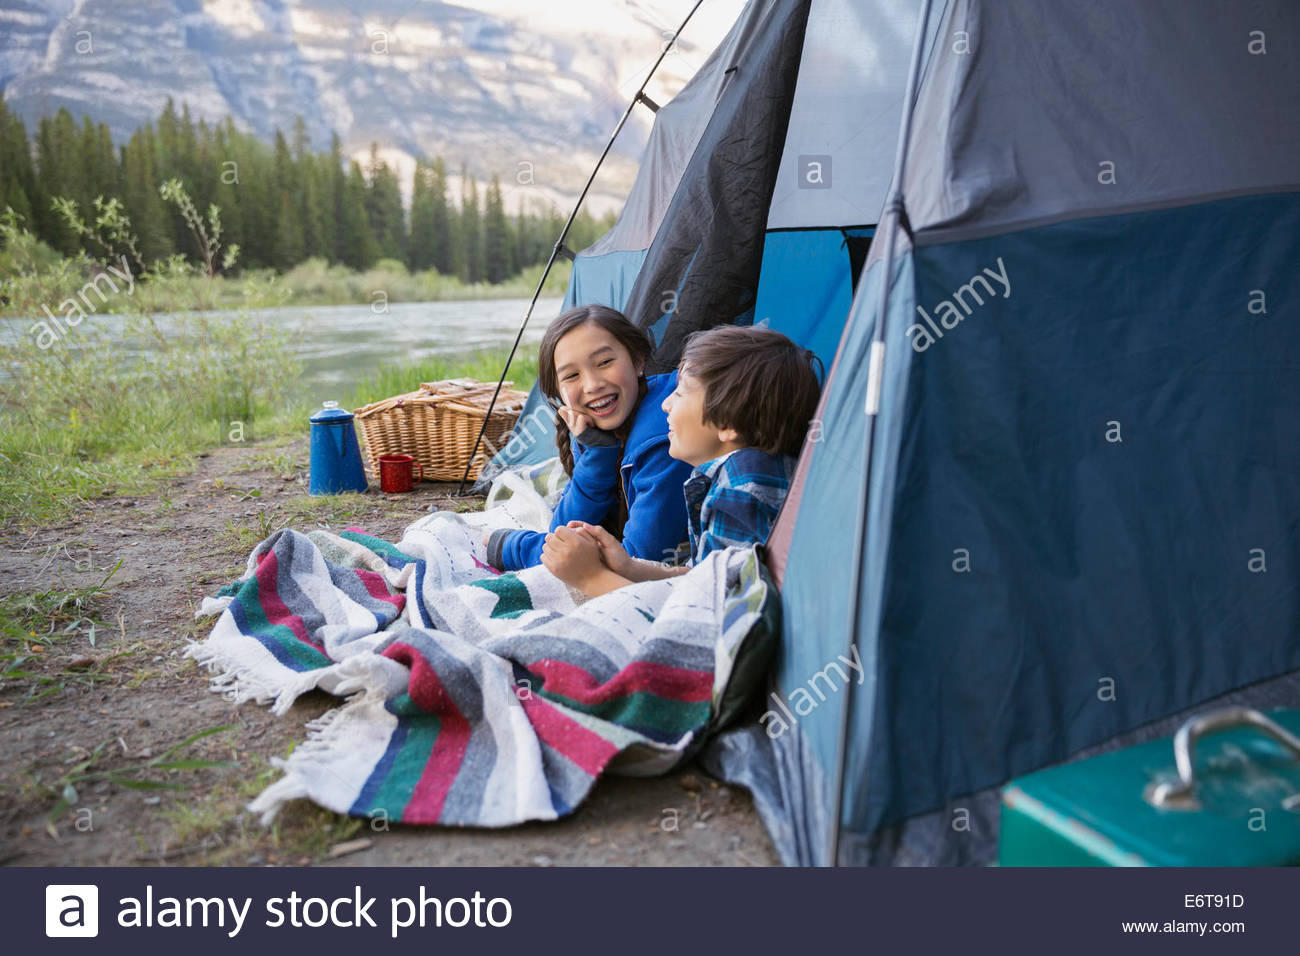 Children relaxing in tent at campsite - Stock Image